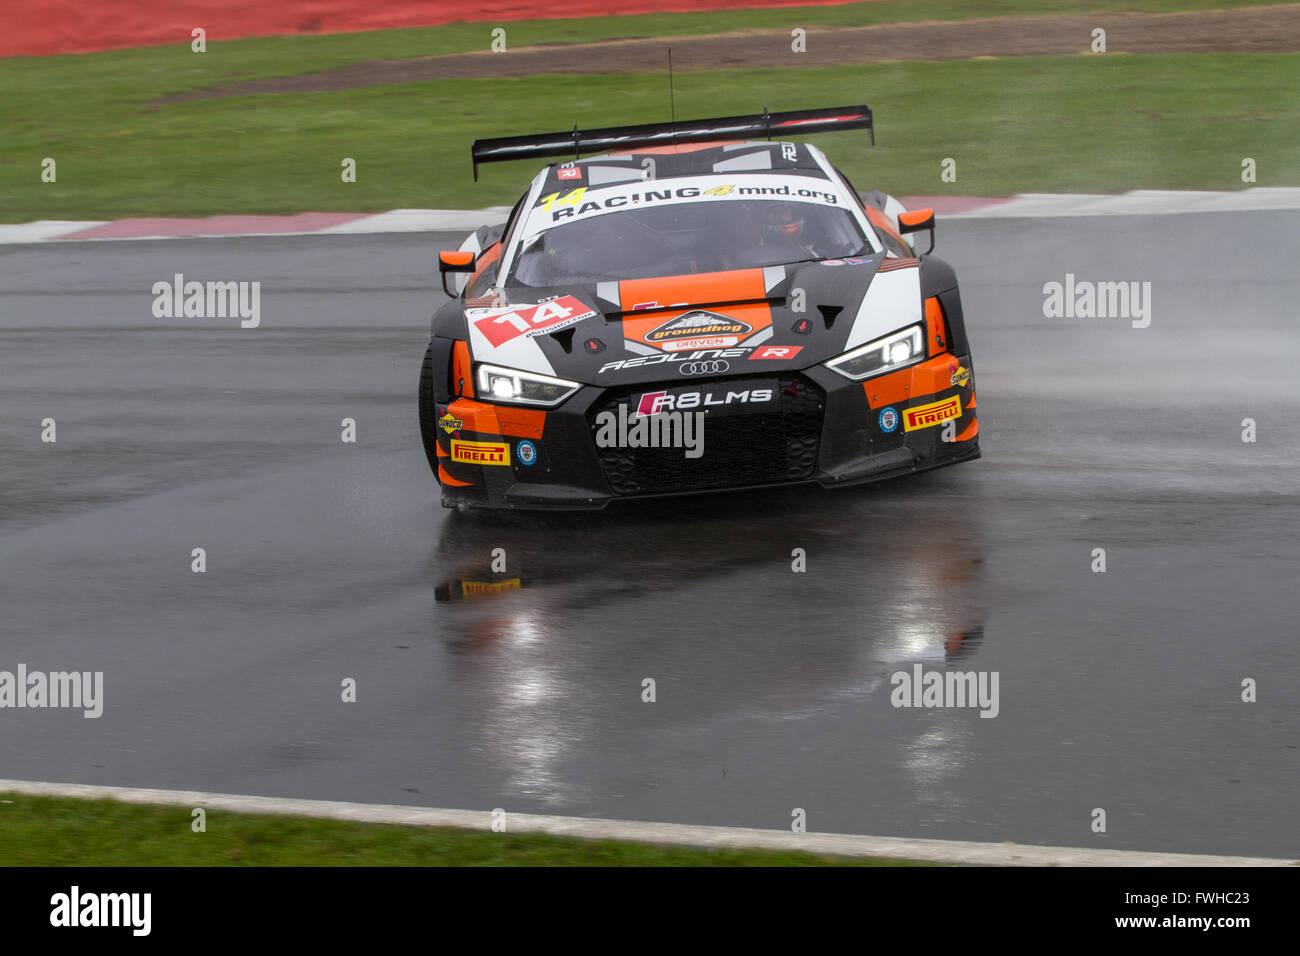 Silverstone, UK. 12th June, 2016. The #14 Optimum Motorsport Audi R8 ...